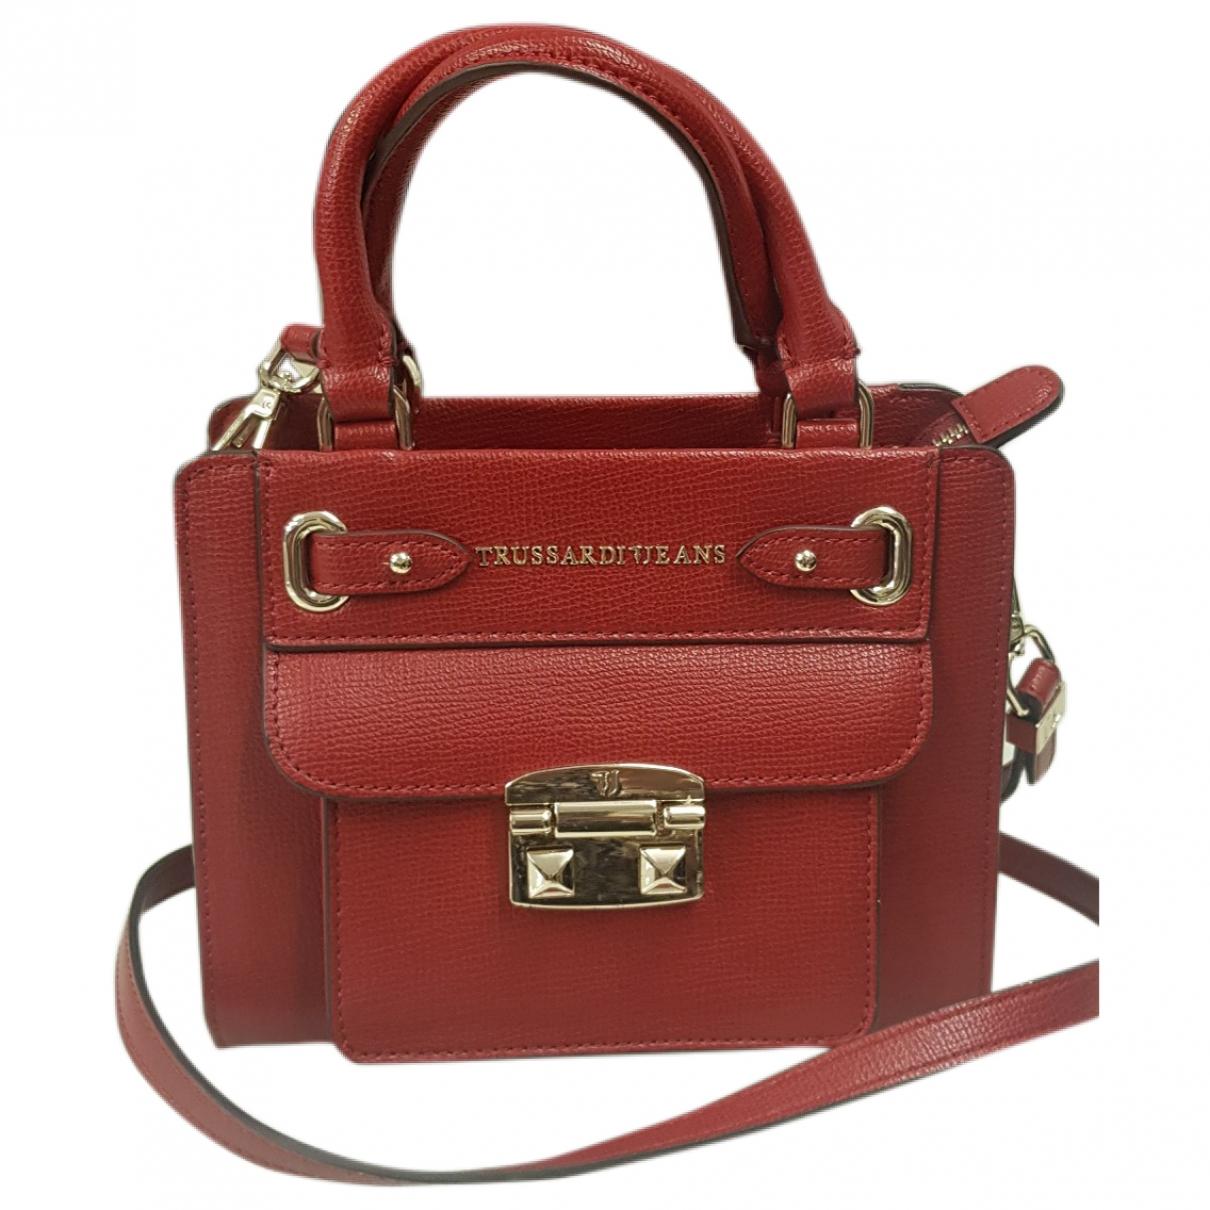 Trussardi Jeans \N Handtasche in  Rot Polyester